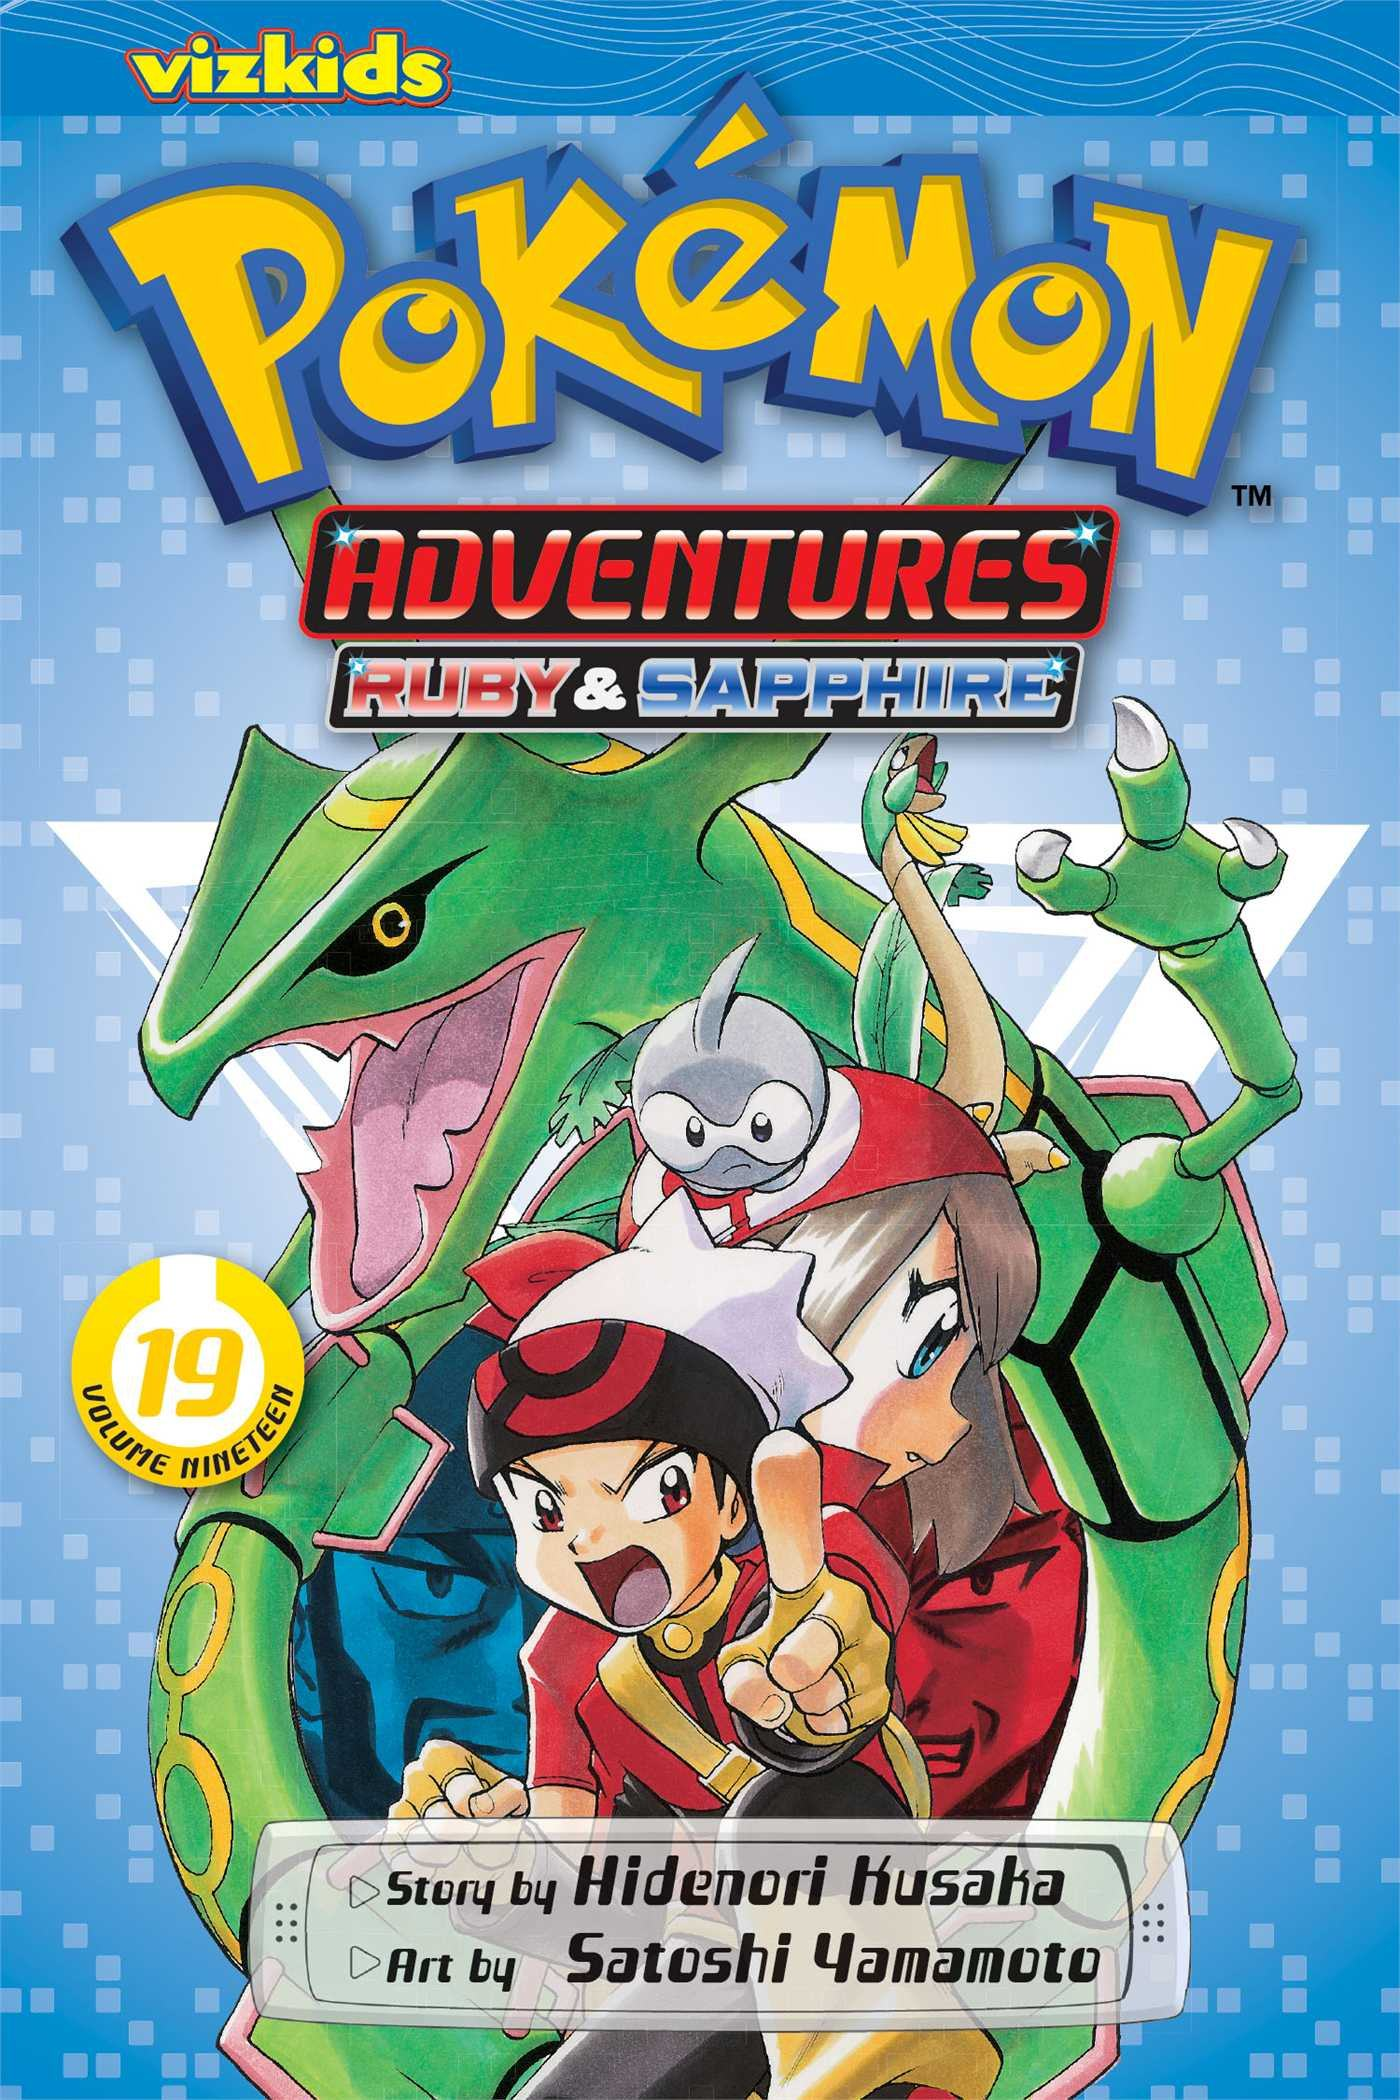 Pokemon_Adventures_v19_cover